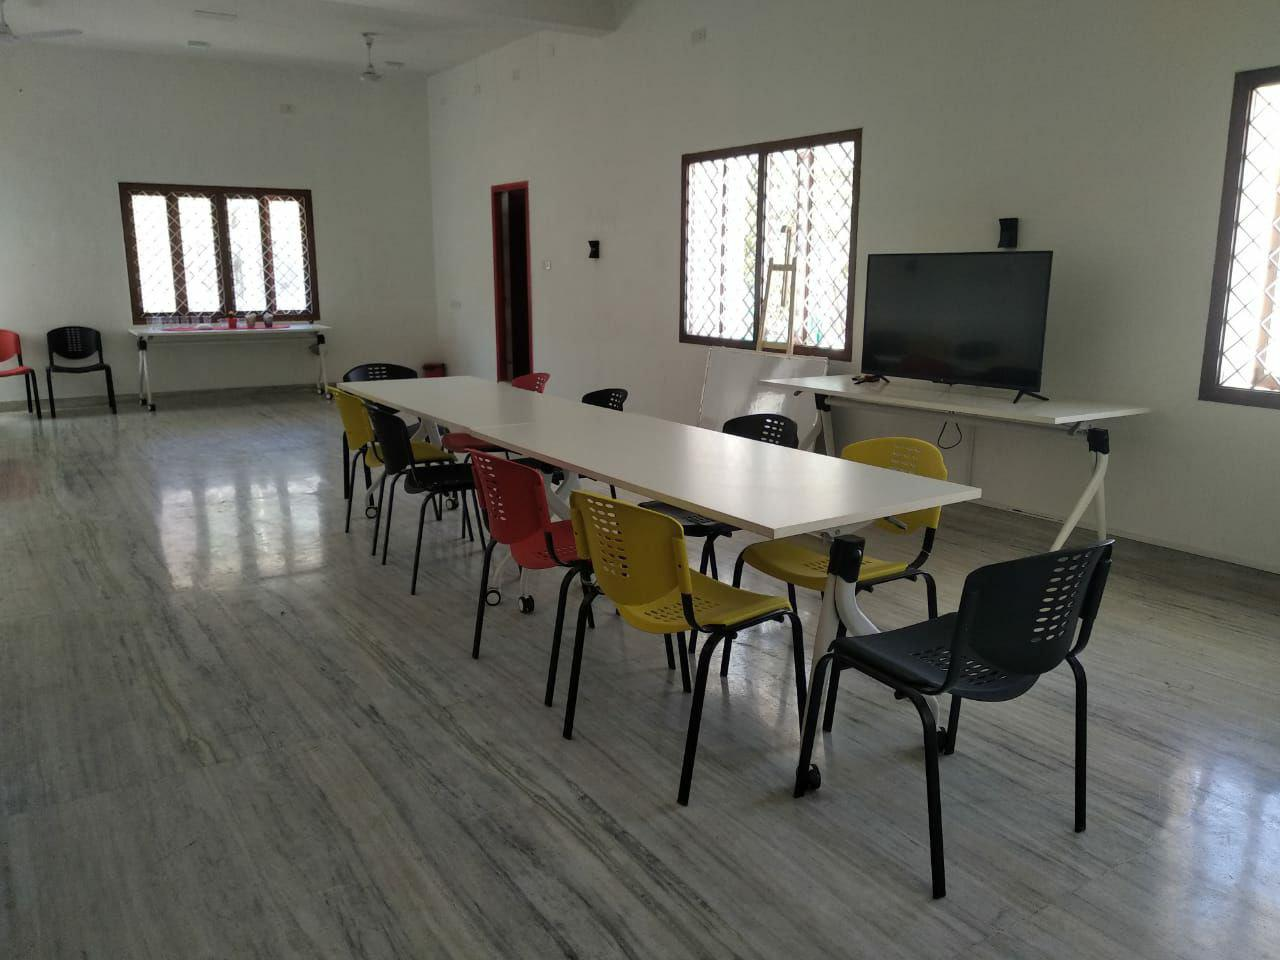 10 Best Coworking Space in Coimbatore [2020 List] 16